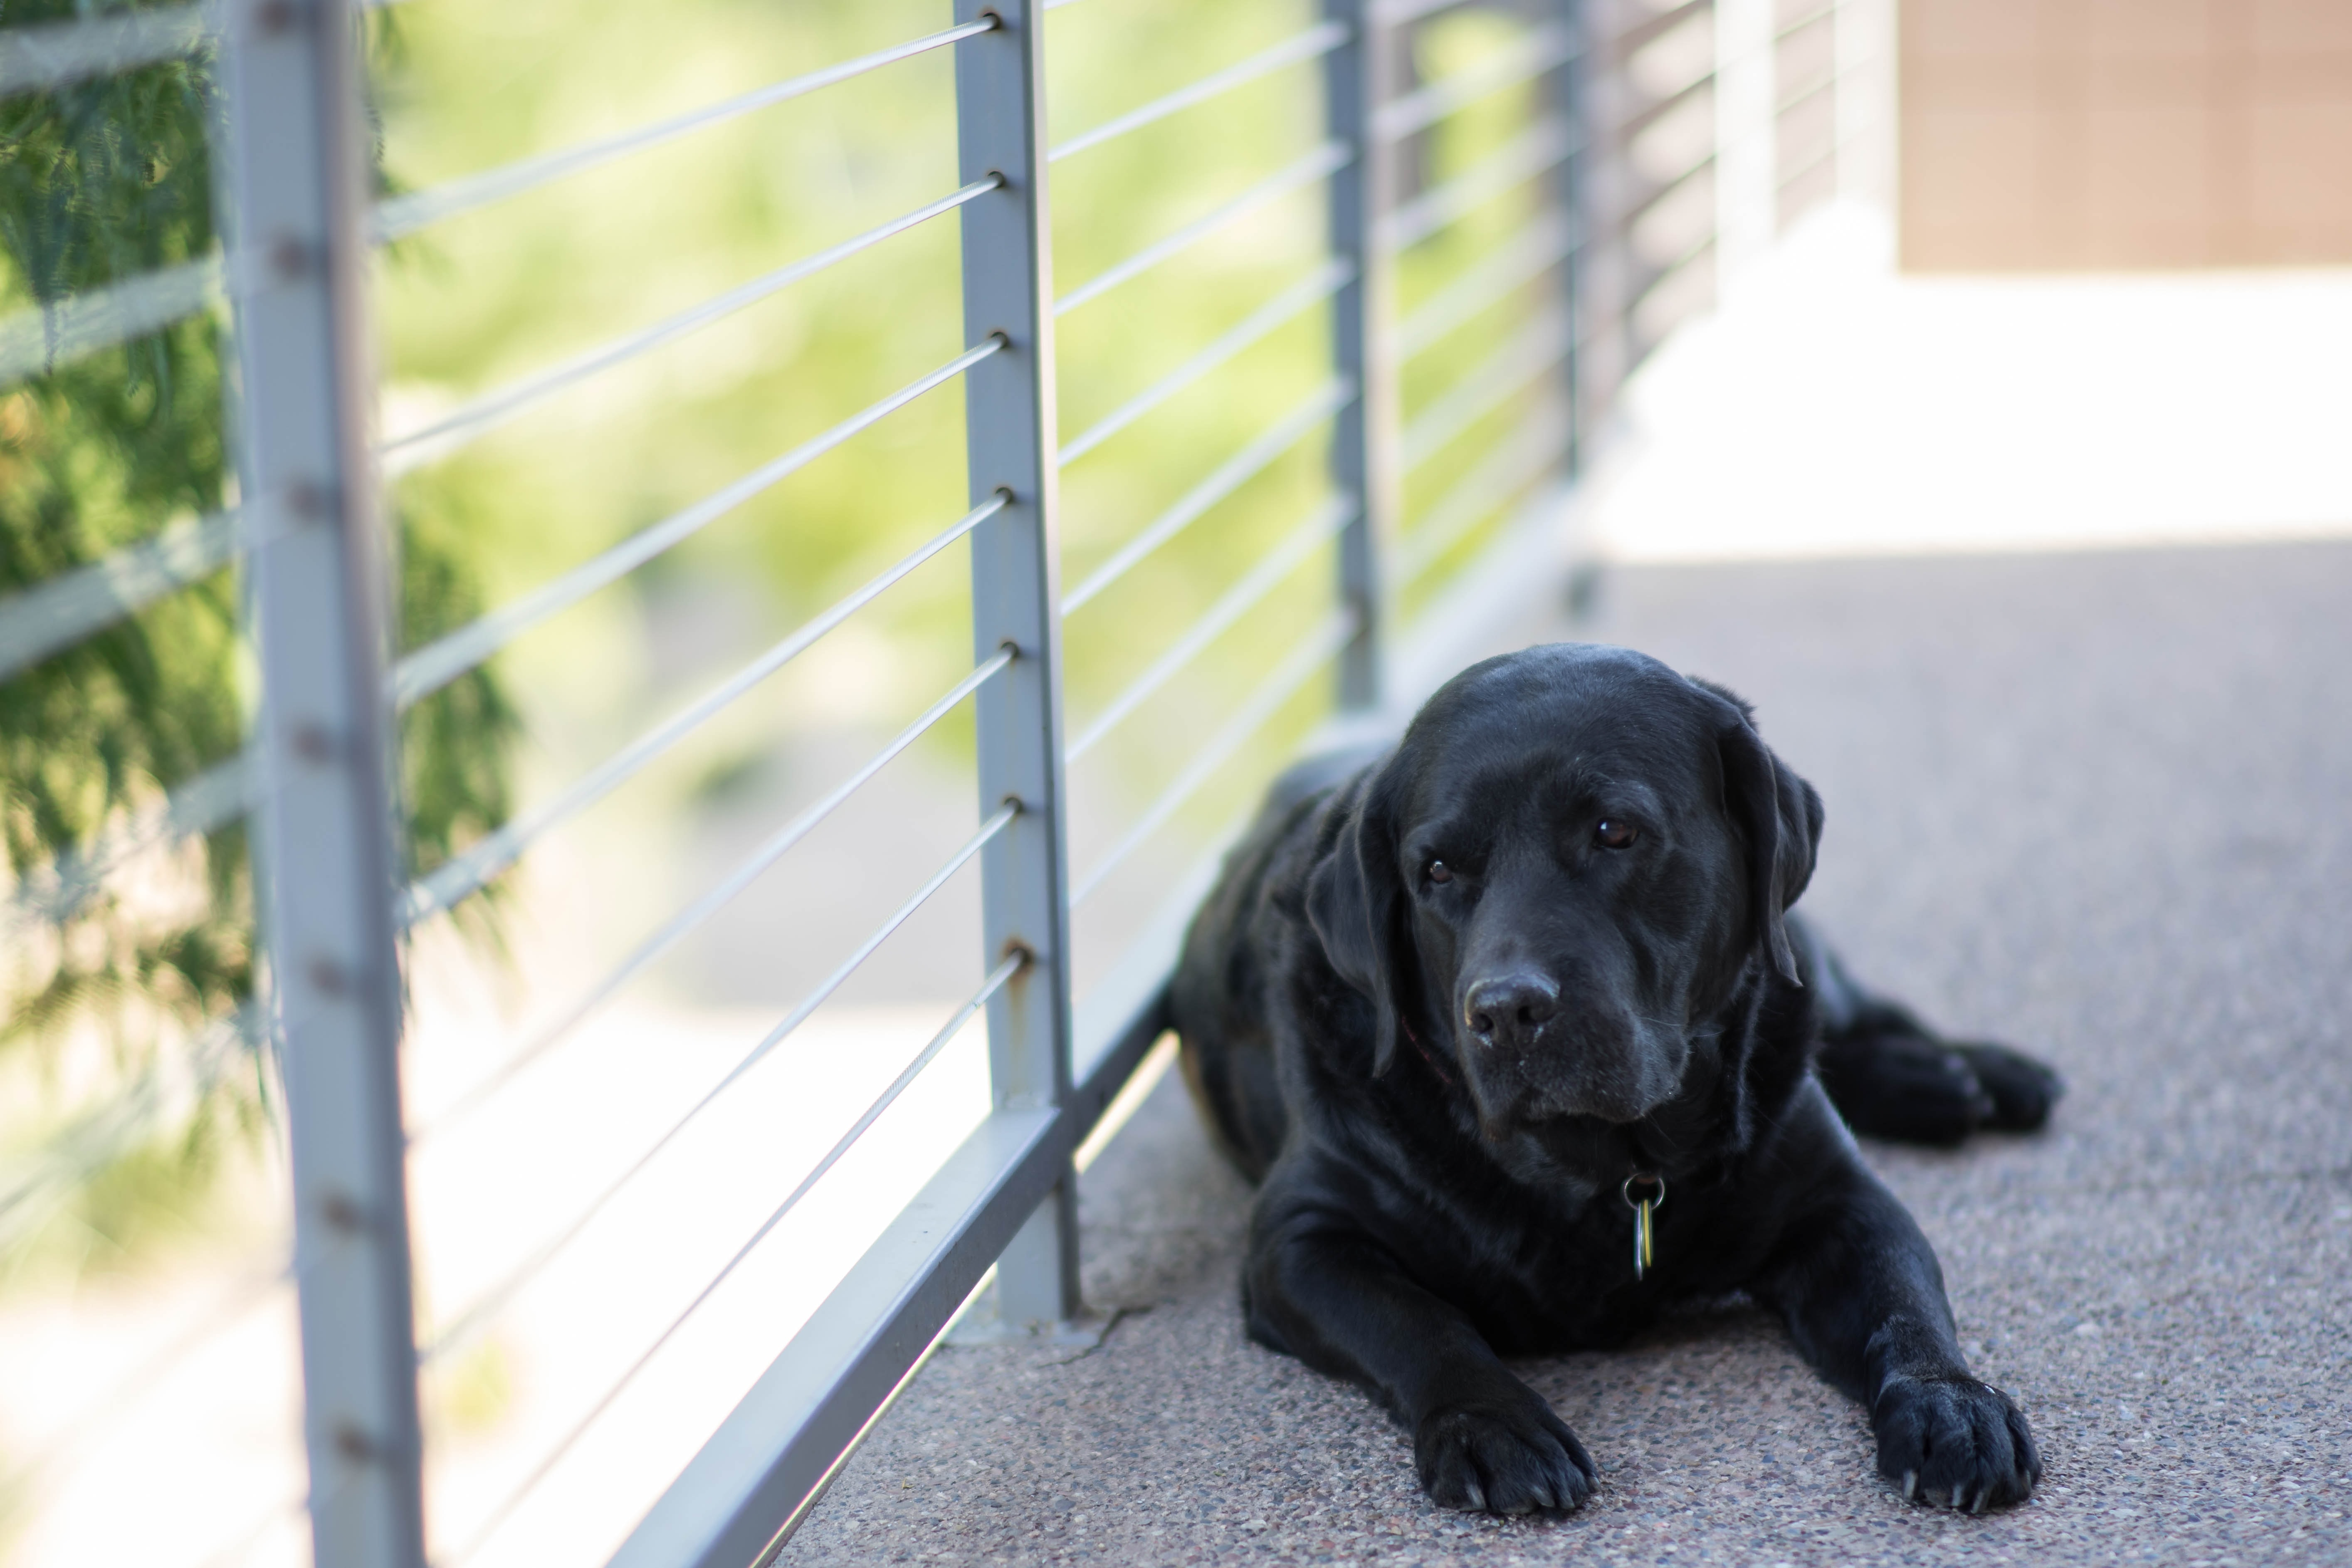 adult black Labrador retriever lying on concrete floor near gray metal handrail